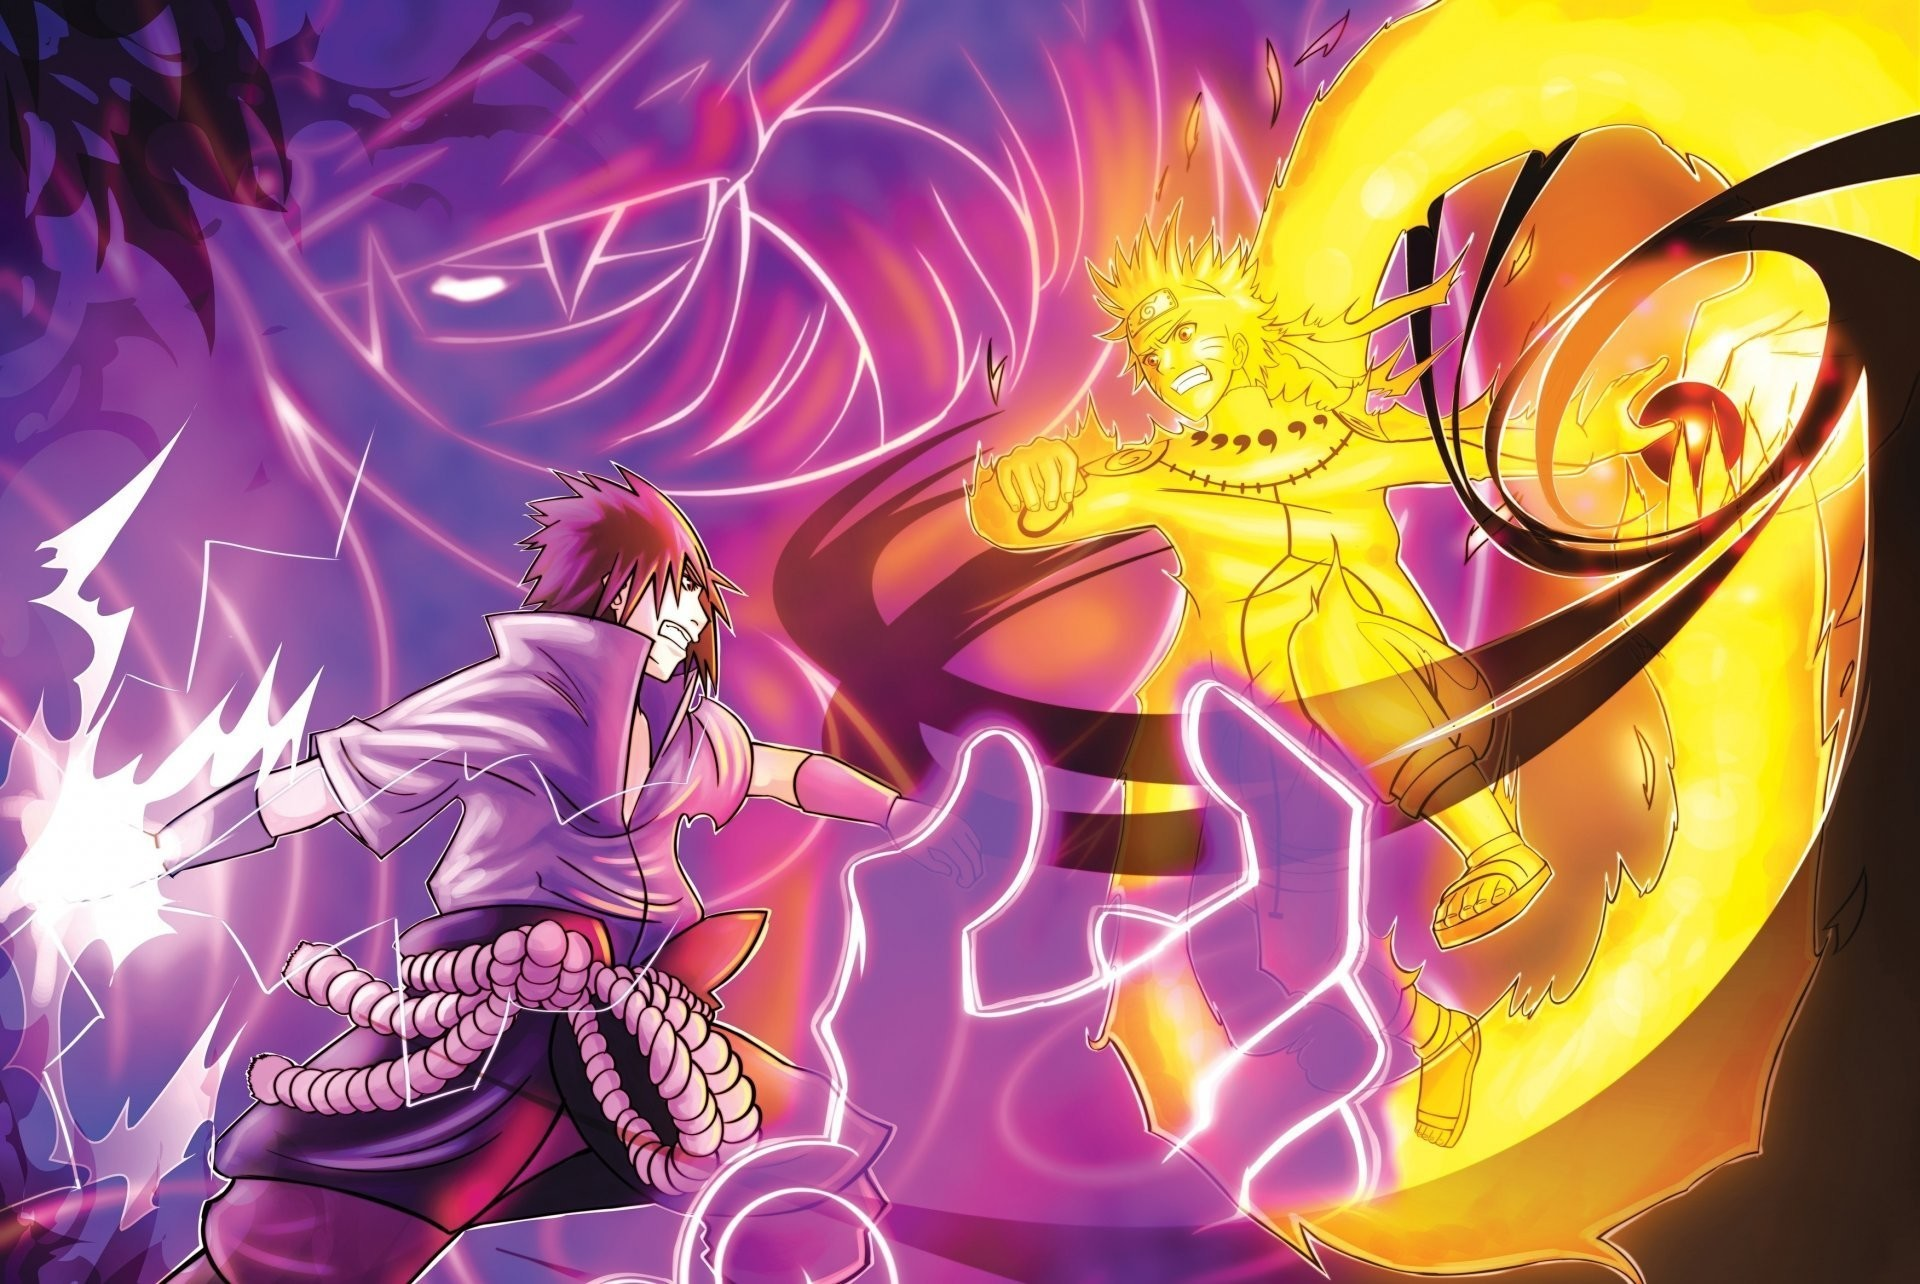 Uzumaki Naruto Shippuden Wallpaper Wallpapertag